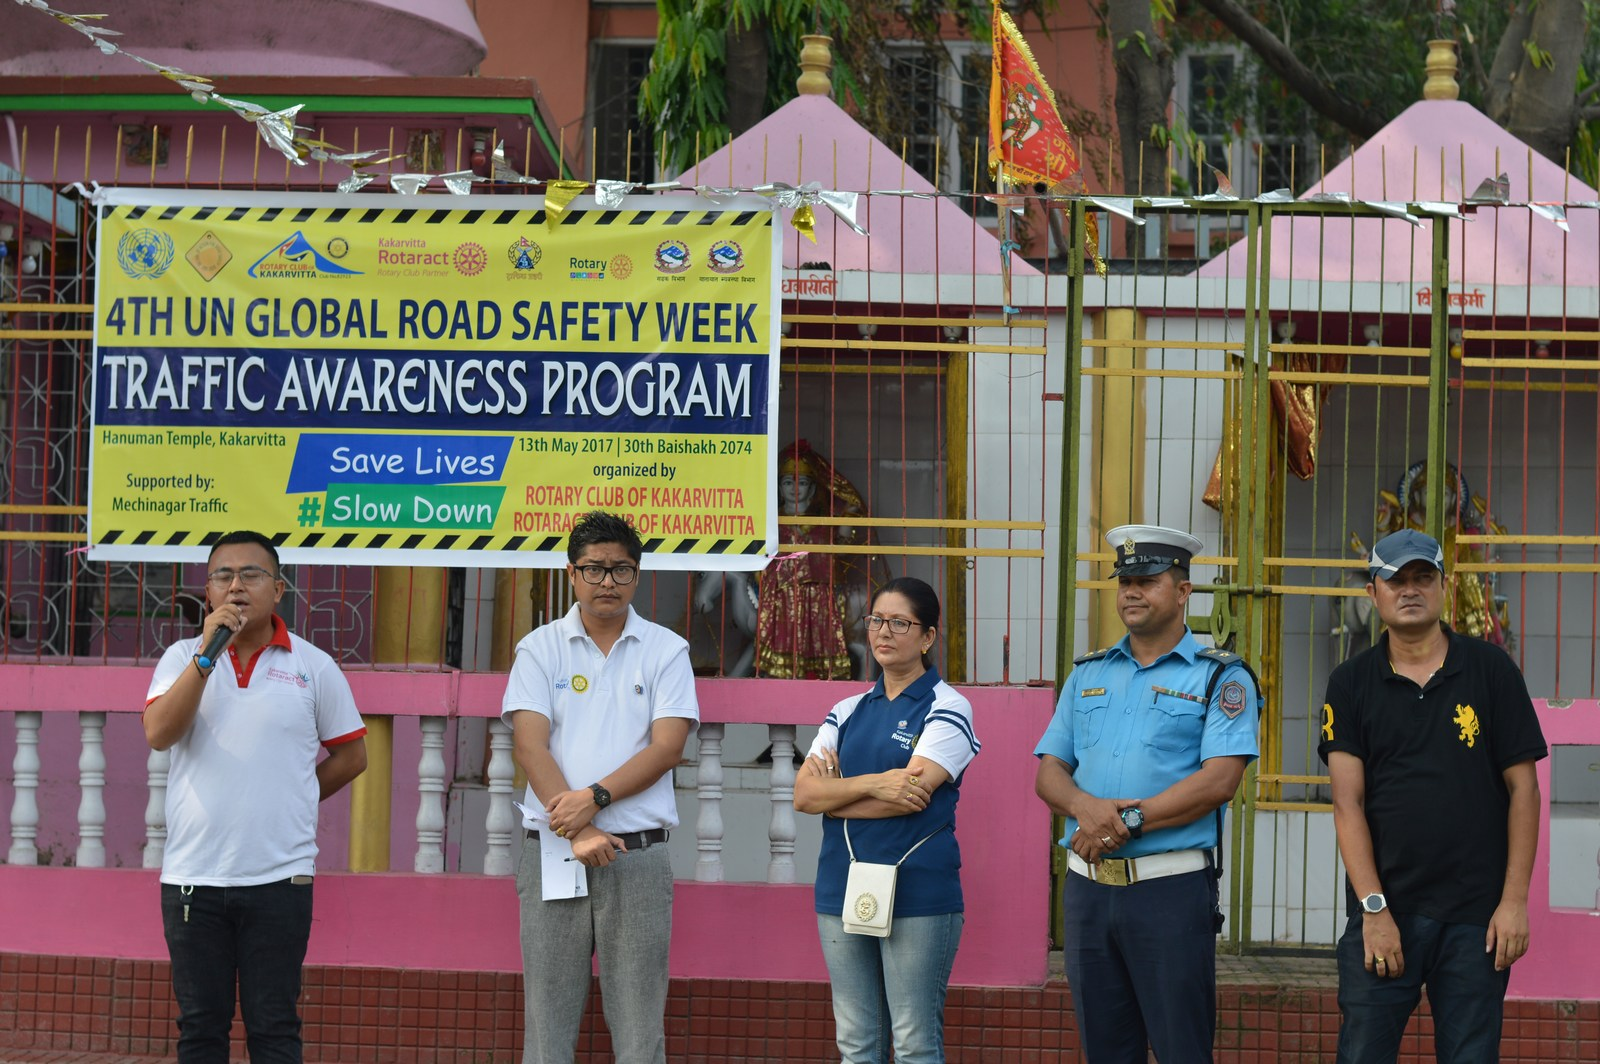 4th-UN-Global-Road-Safety-Week-2017-Traffic-Awareness-Program-Rotary-club-of-Kakarvitta-12